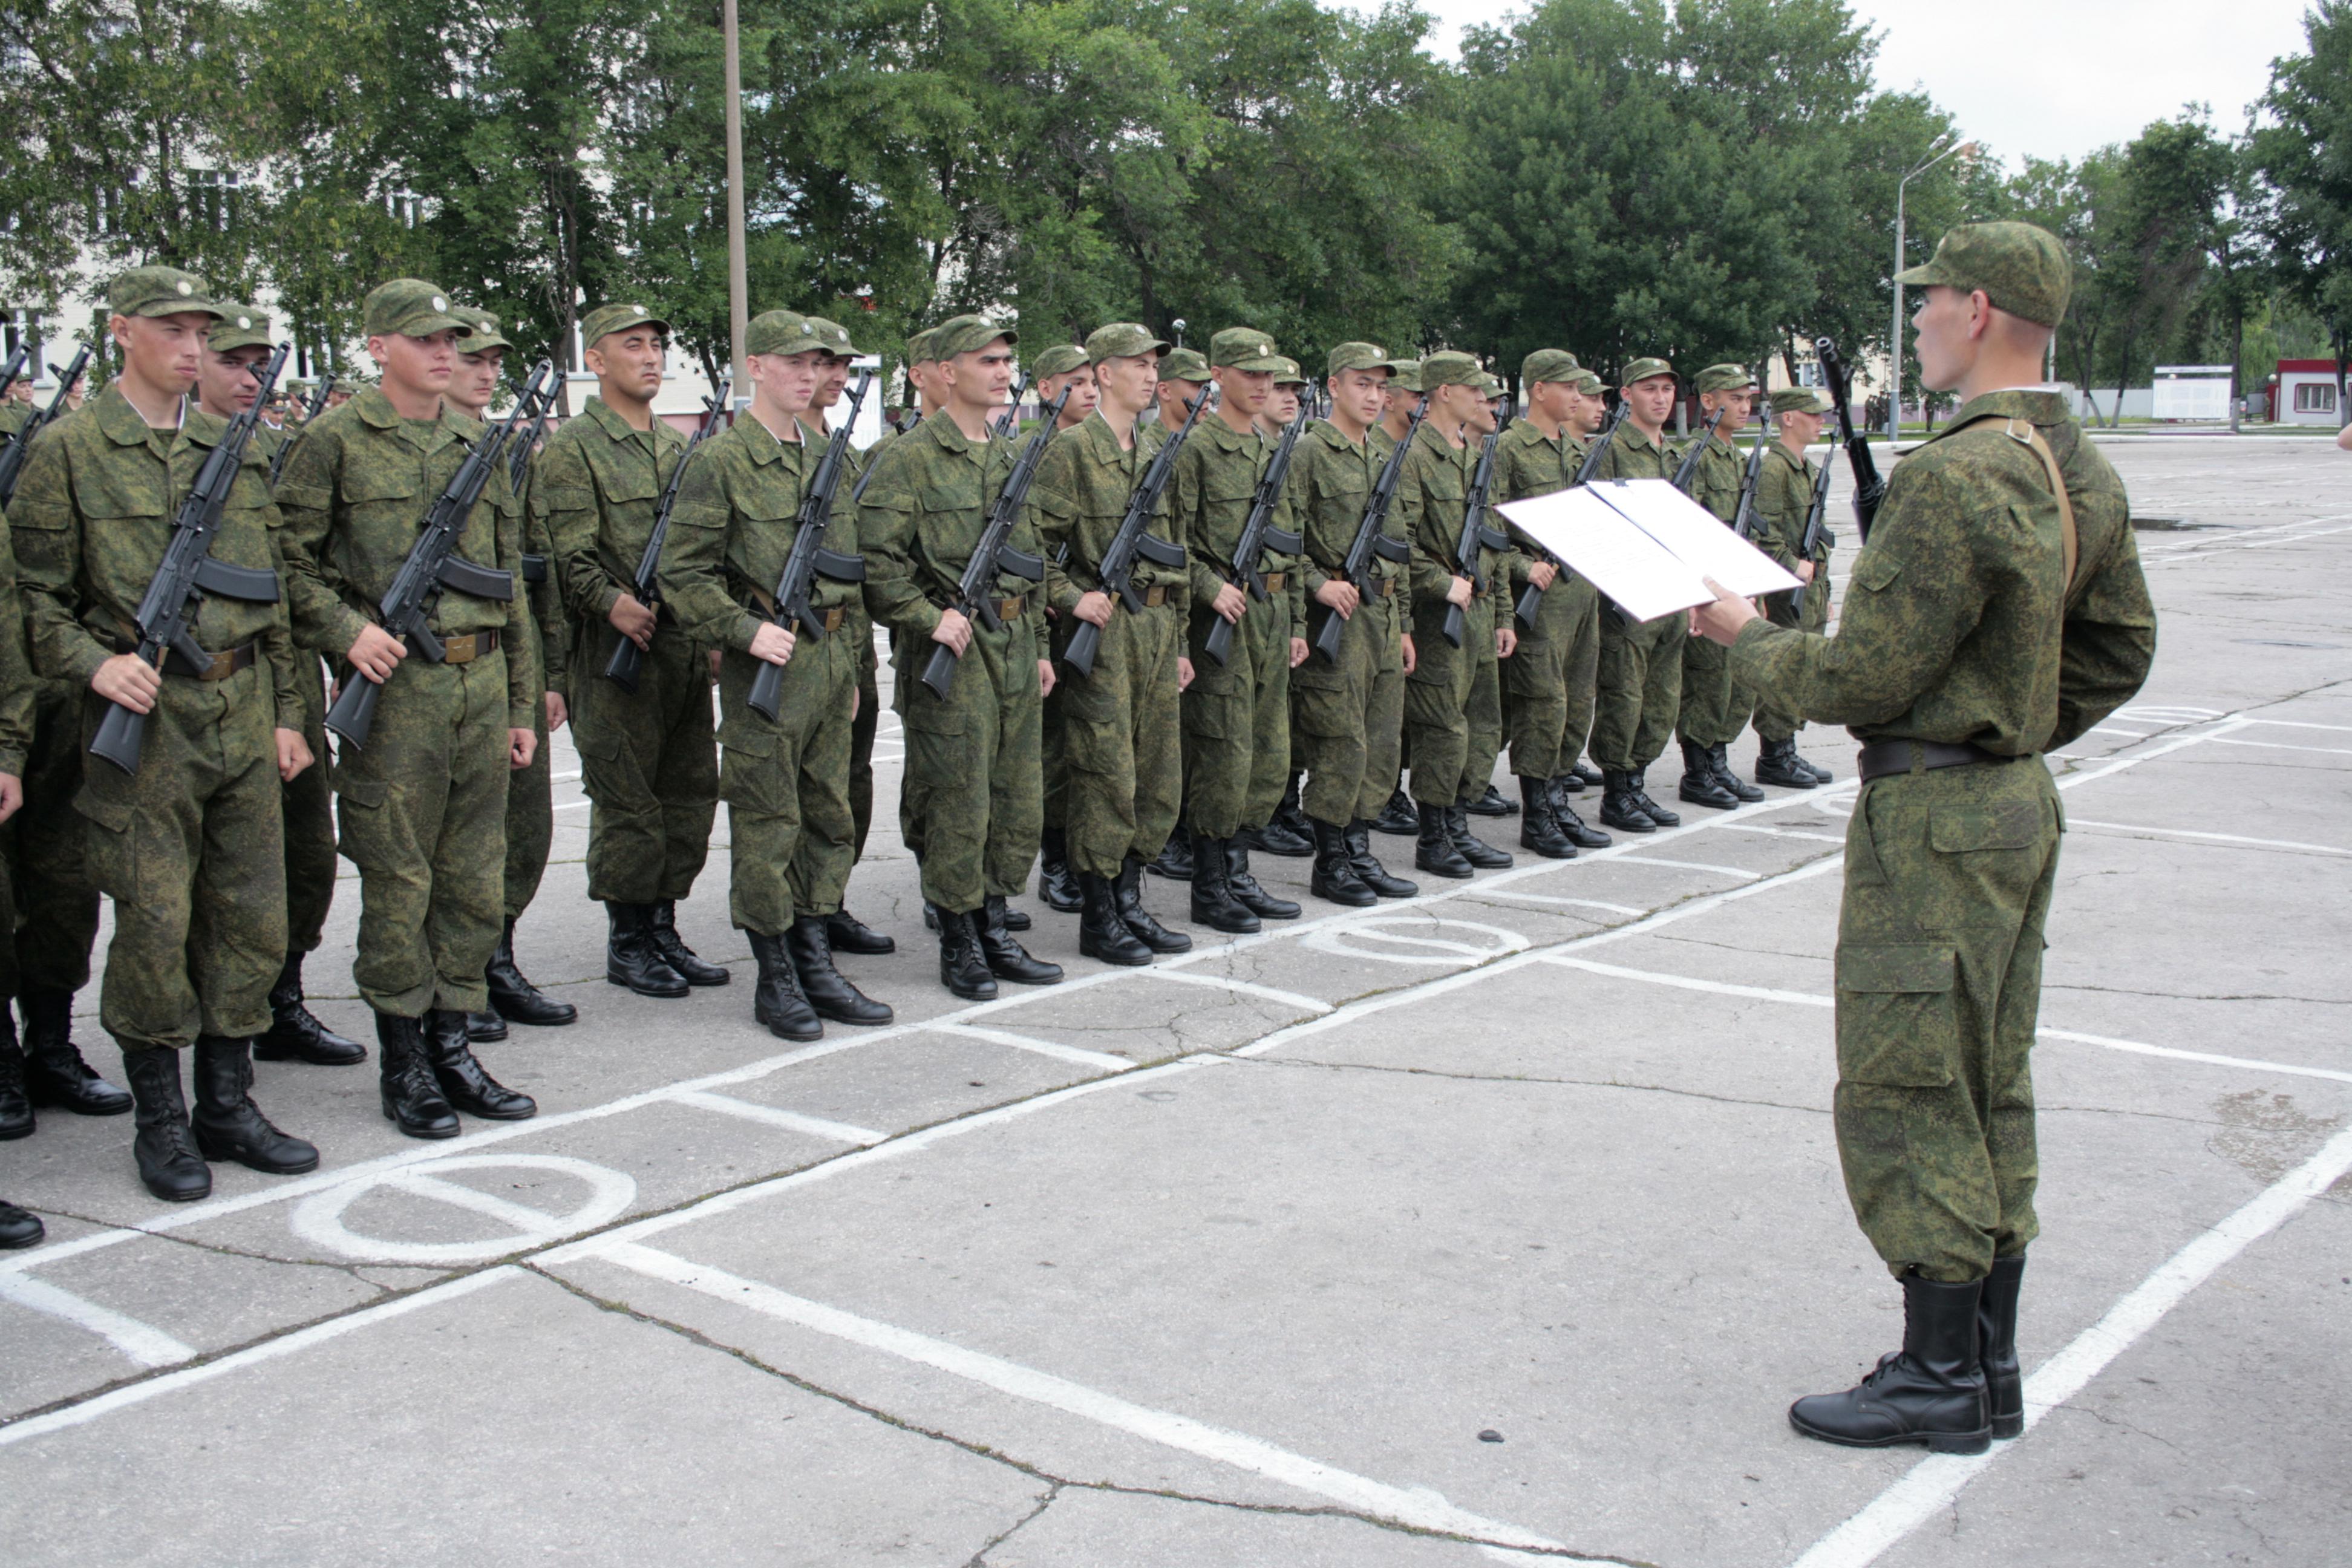 Oath photo